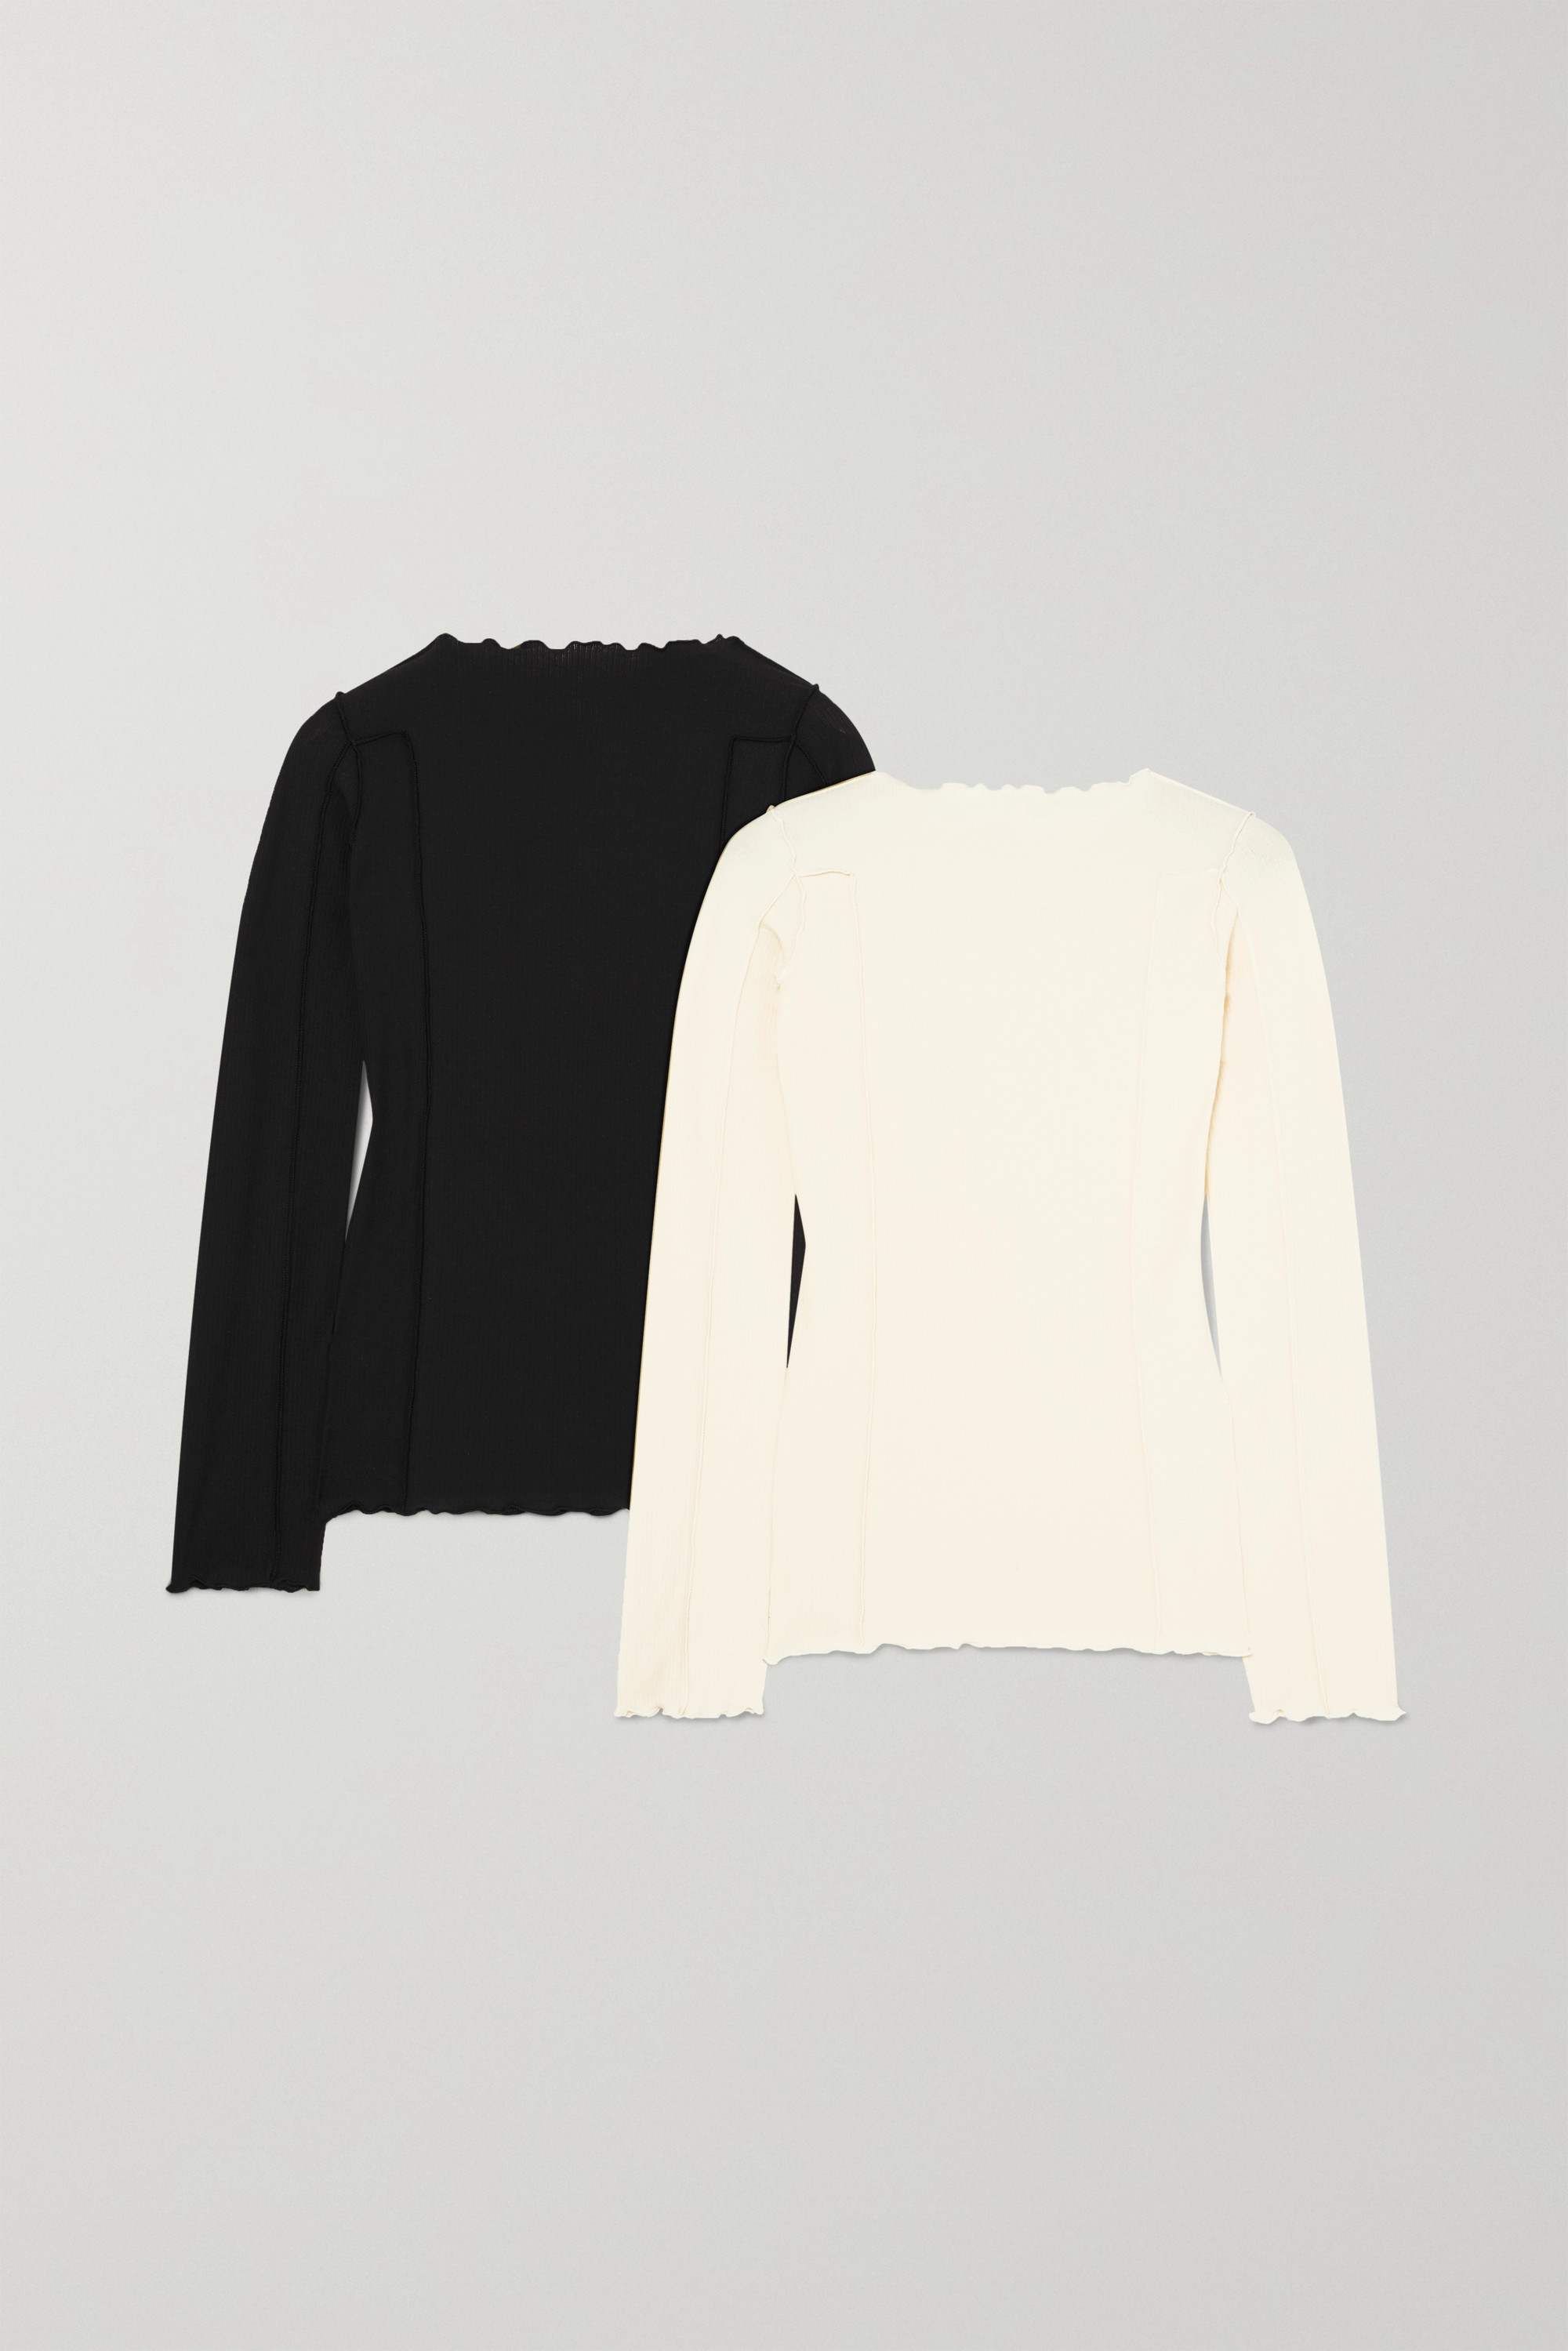 Baserange + NET SUSTAIN Omato set of two ribbed stretch organic cotton tops